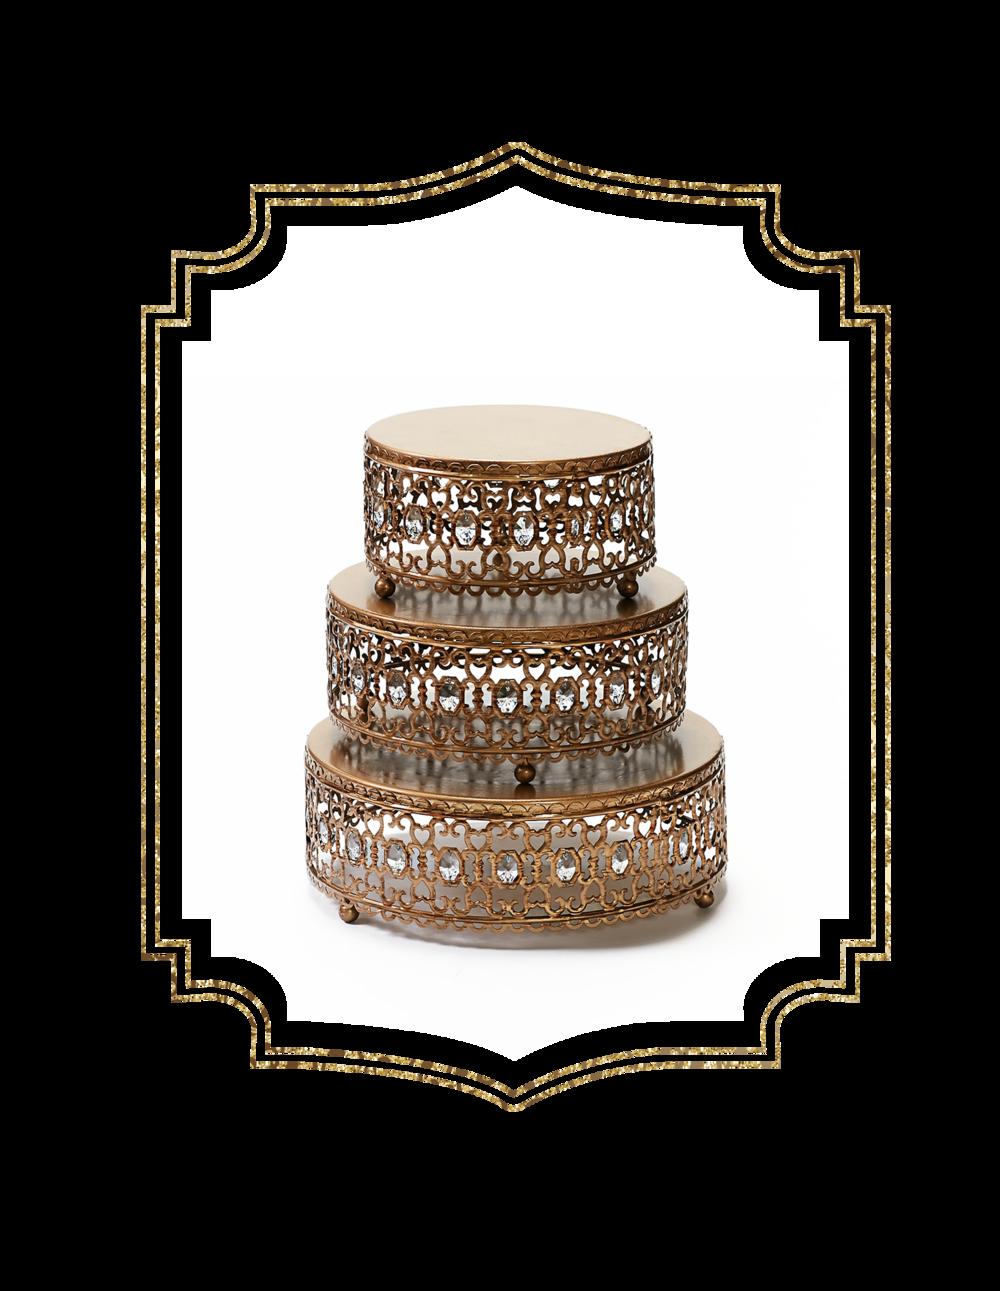 Gold Jeweled Cake Stand